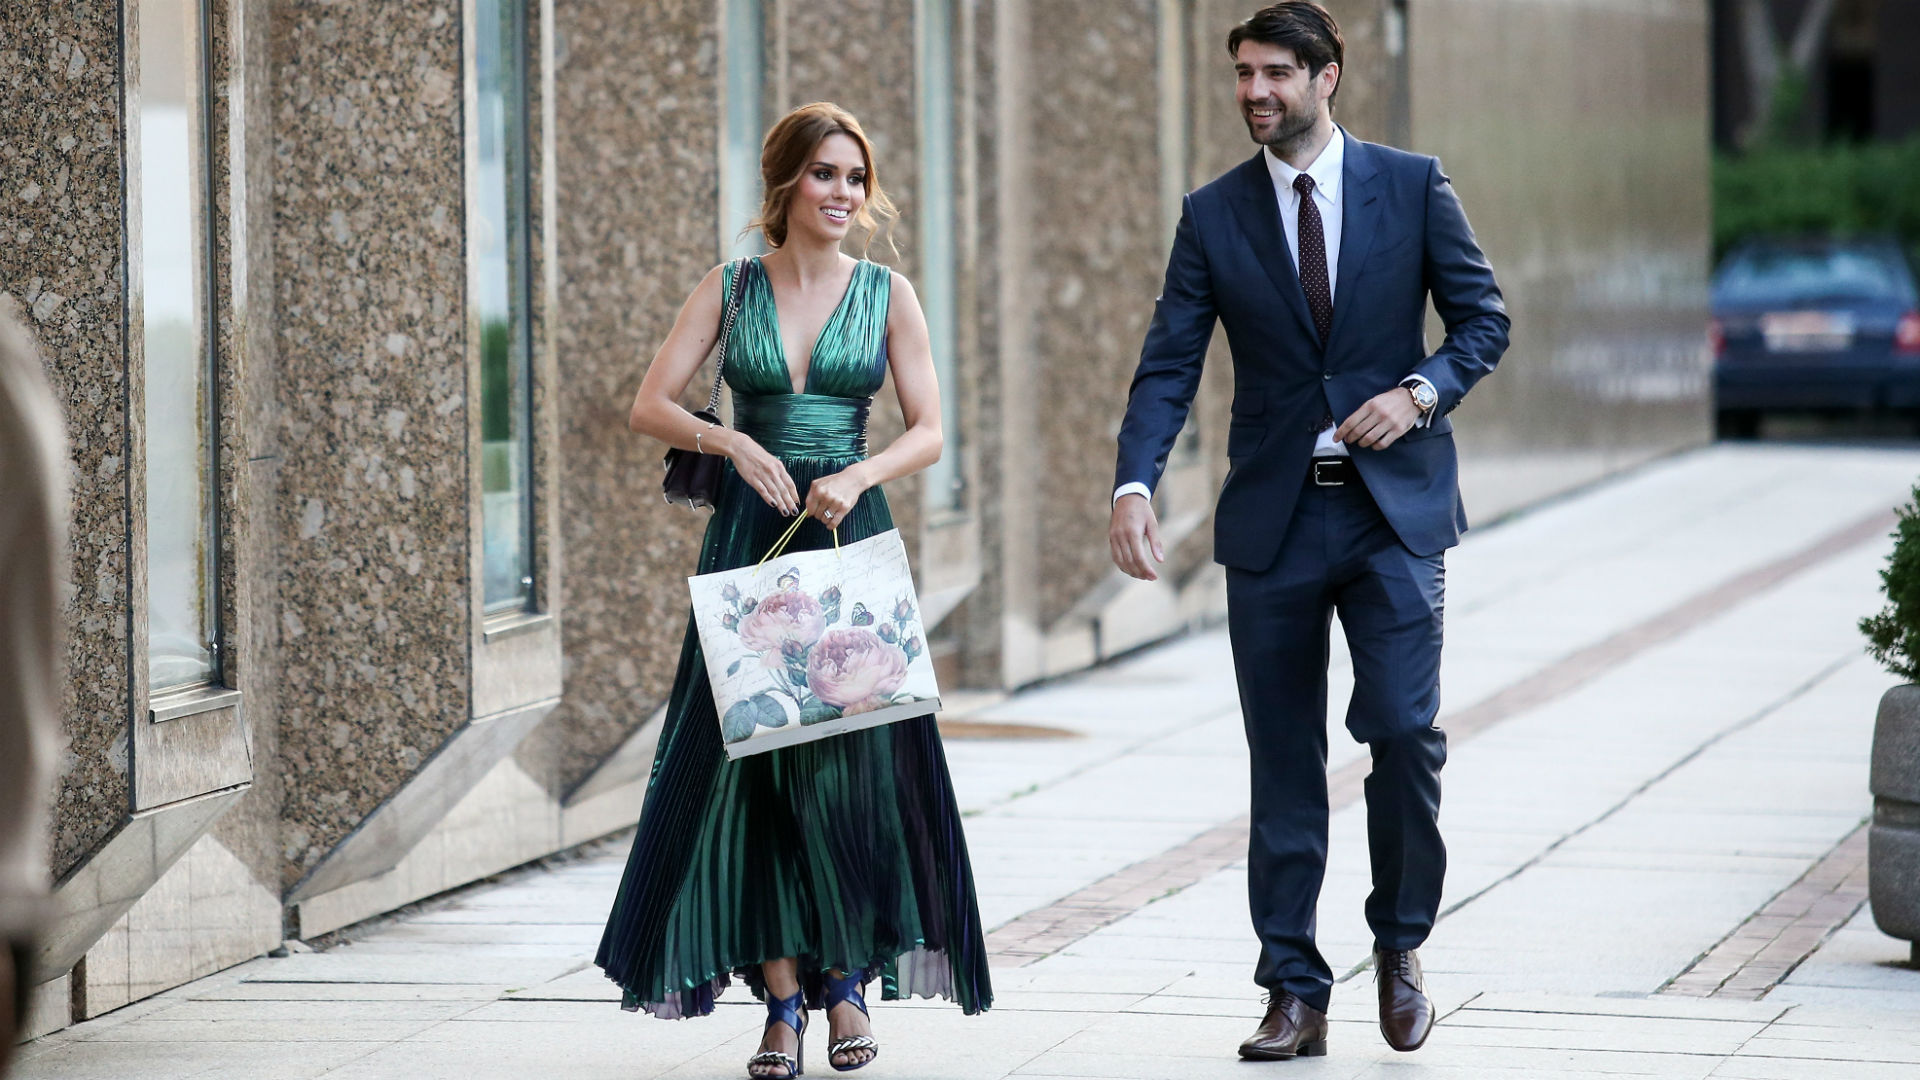 vedran corluka franka batelic - mateo kovacic wedding - 17062017